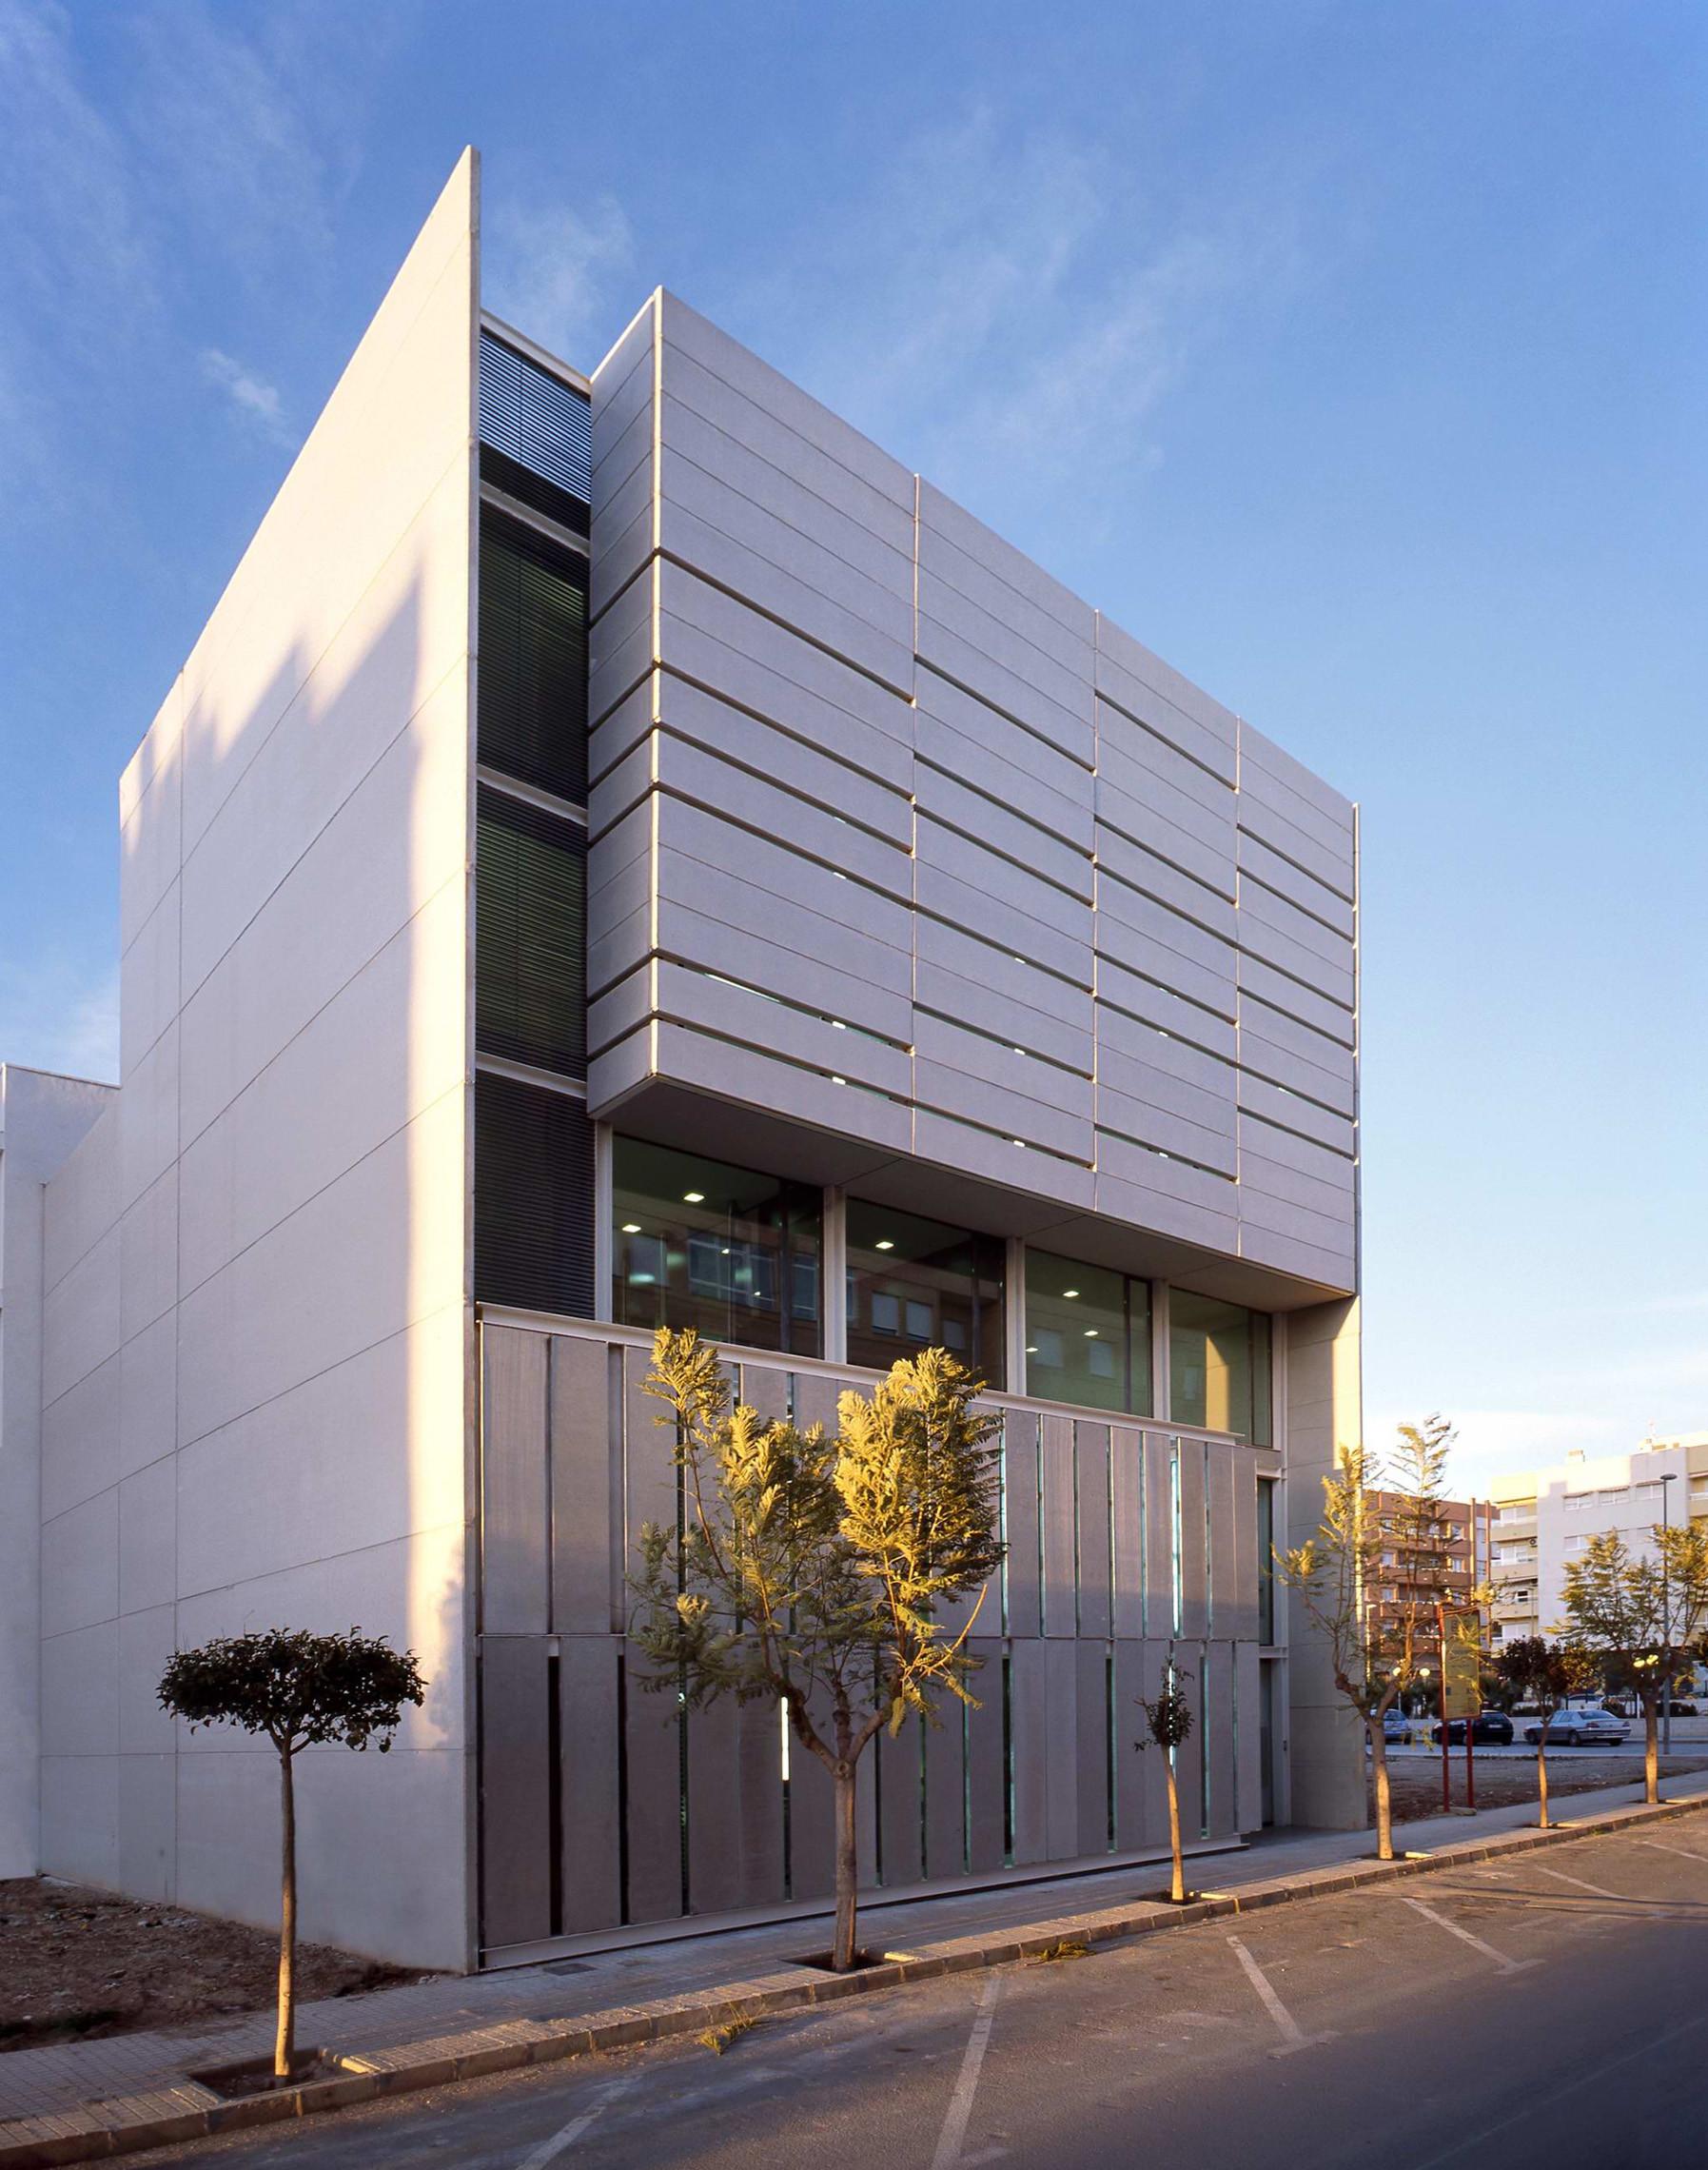 Servef Center in Novelda / Calatayud-Navarro Arquitectos